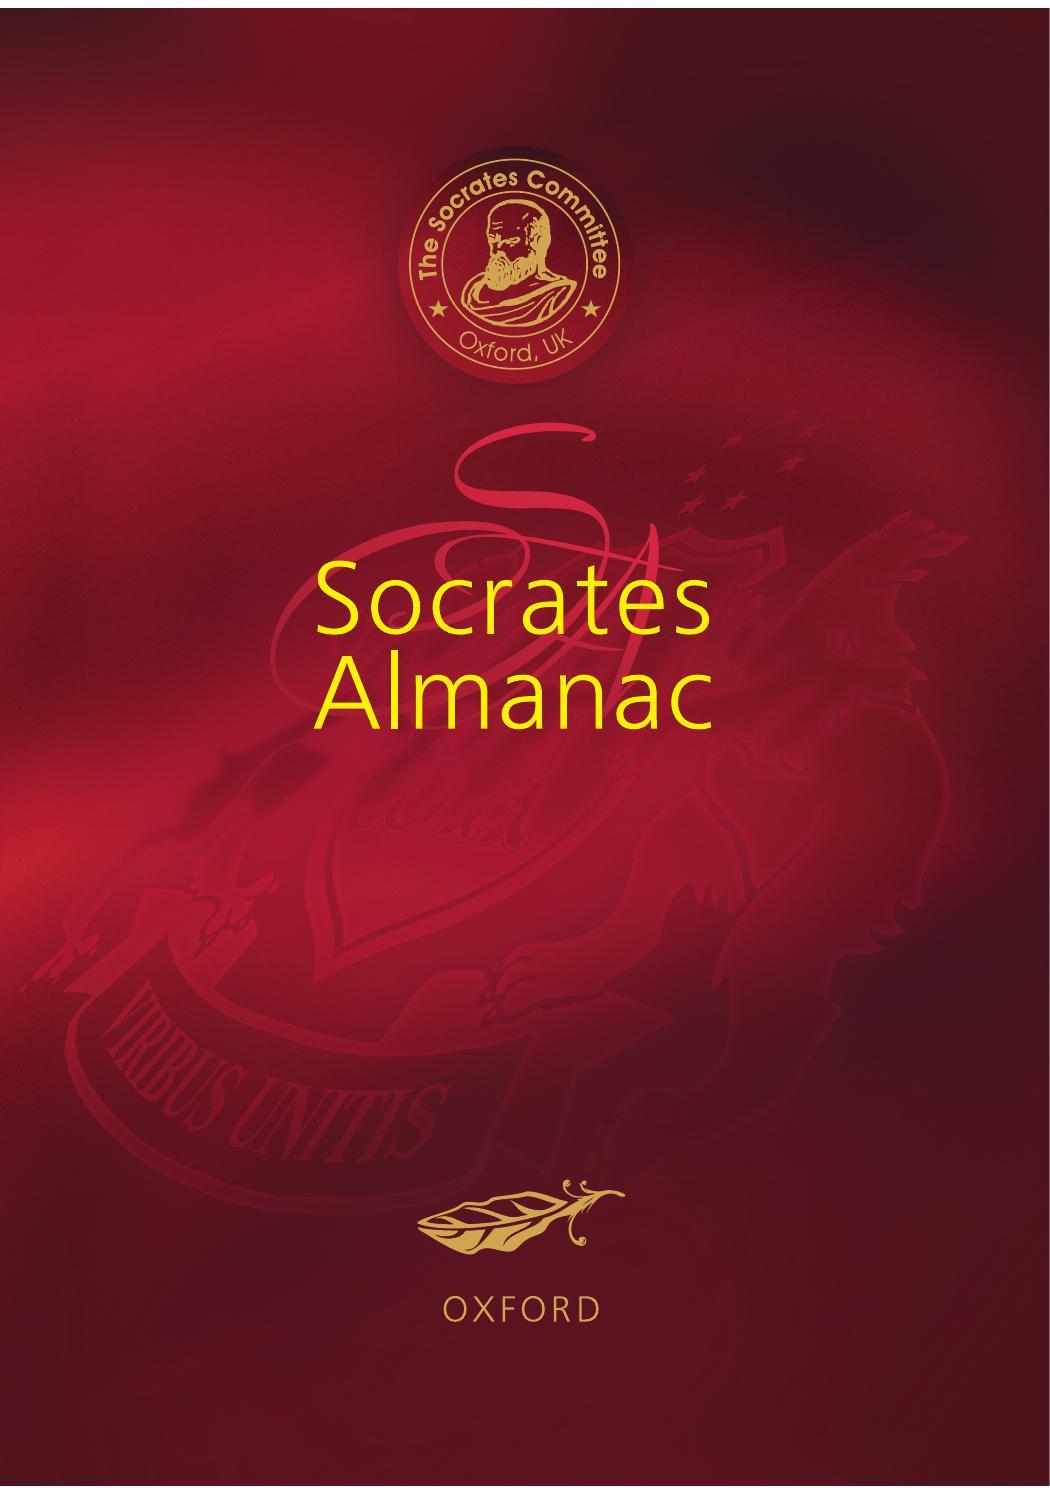 Socrates almanac 2013 by maryna issuu fandeluxe Gallery